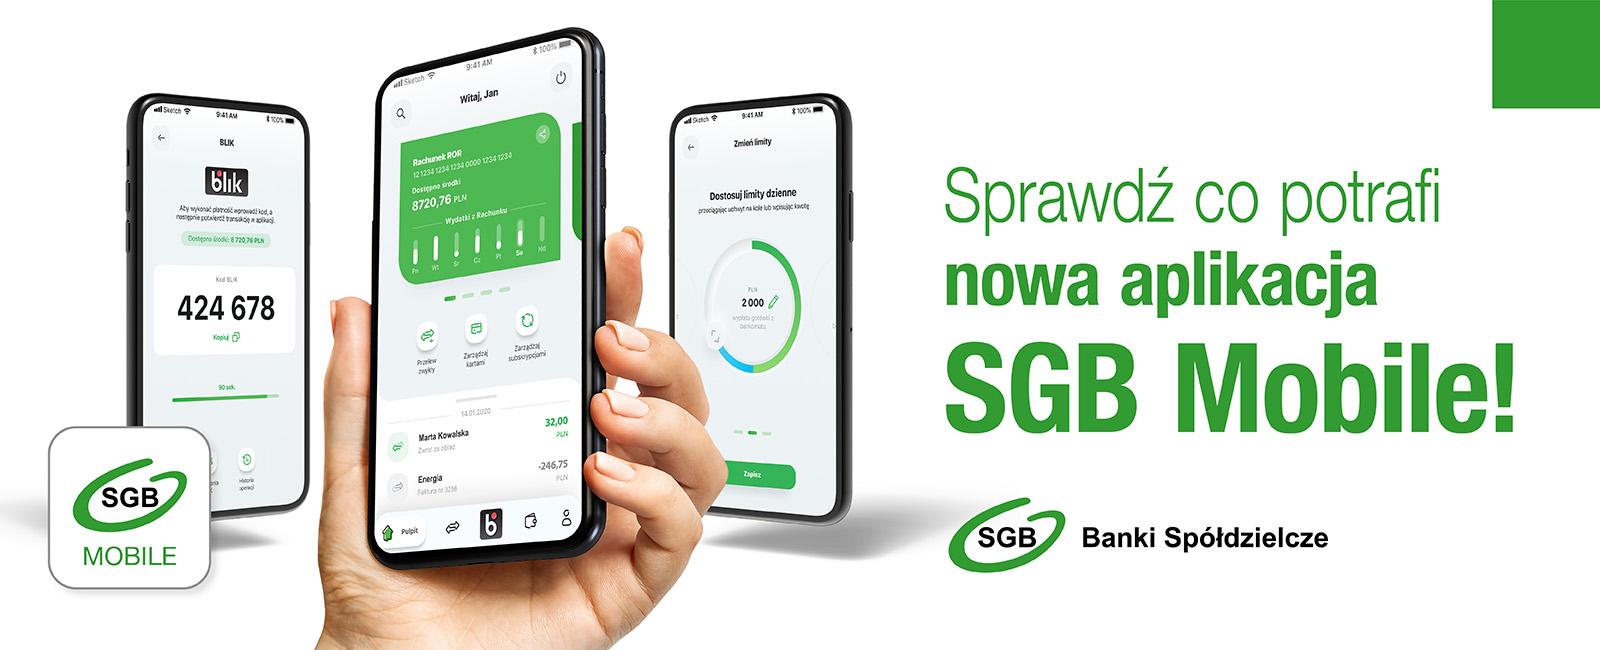 SGB mobile_1600x650